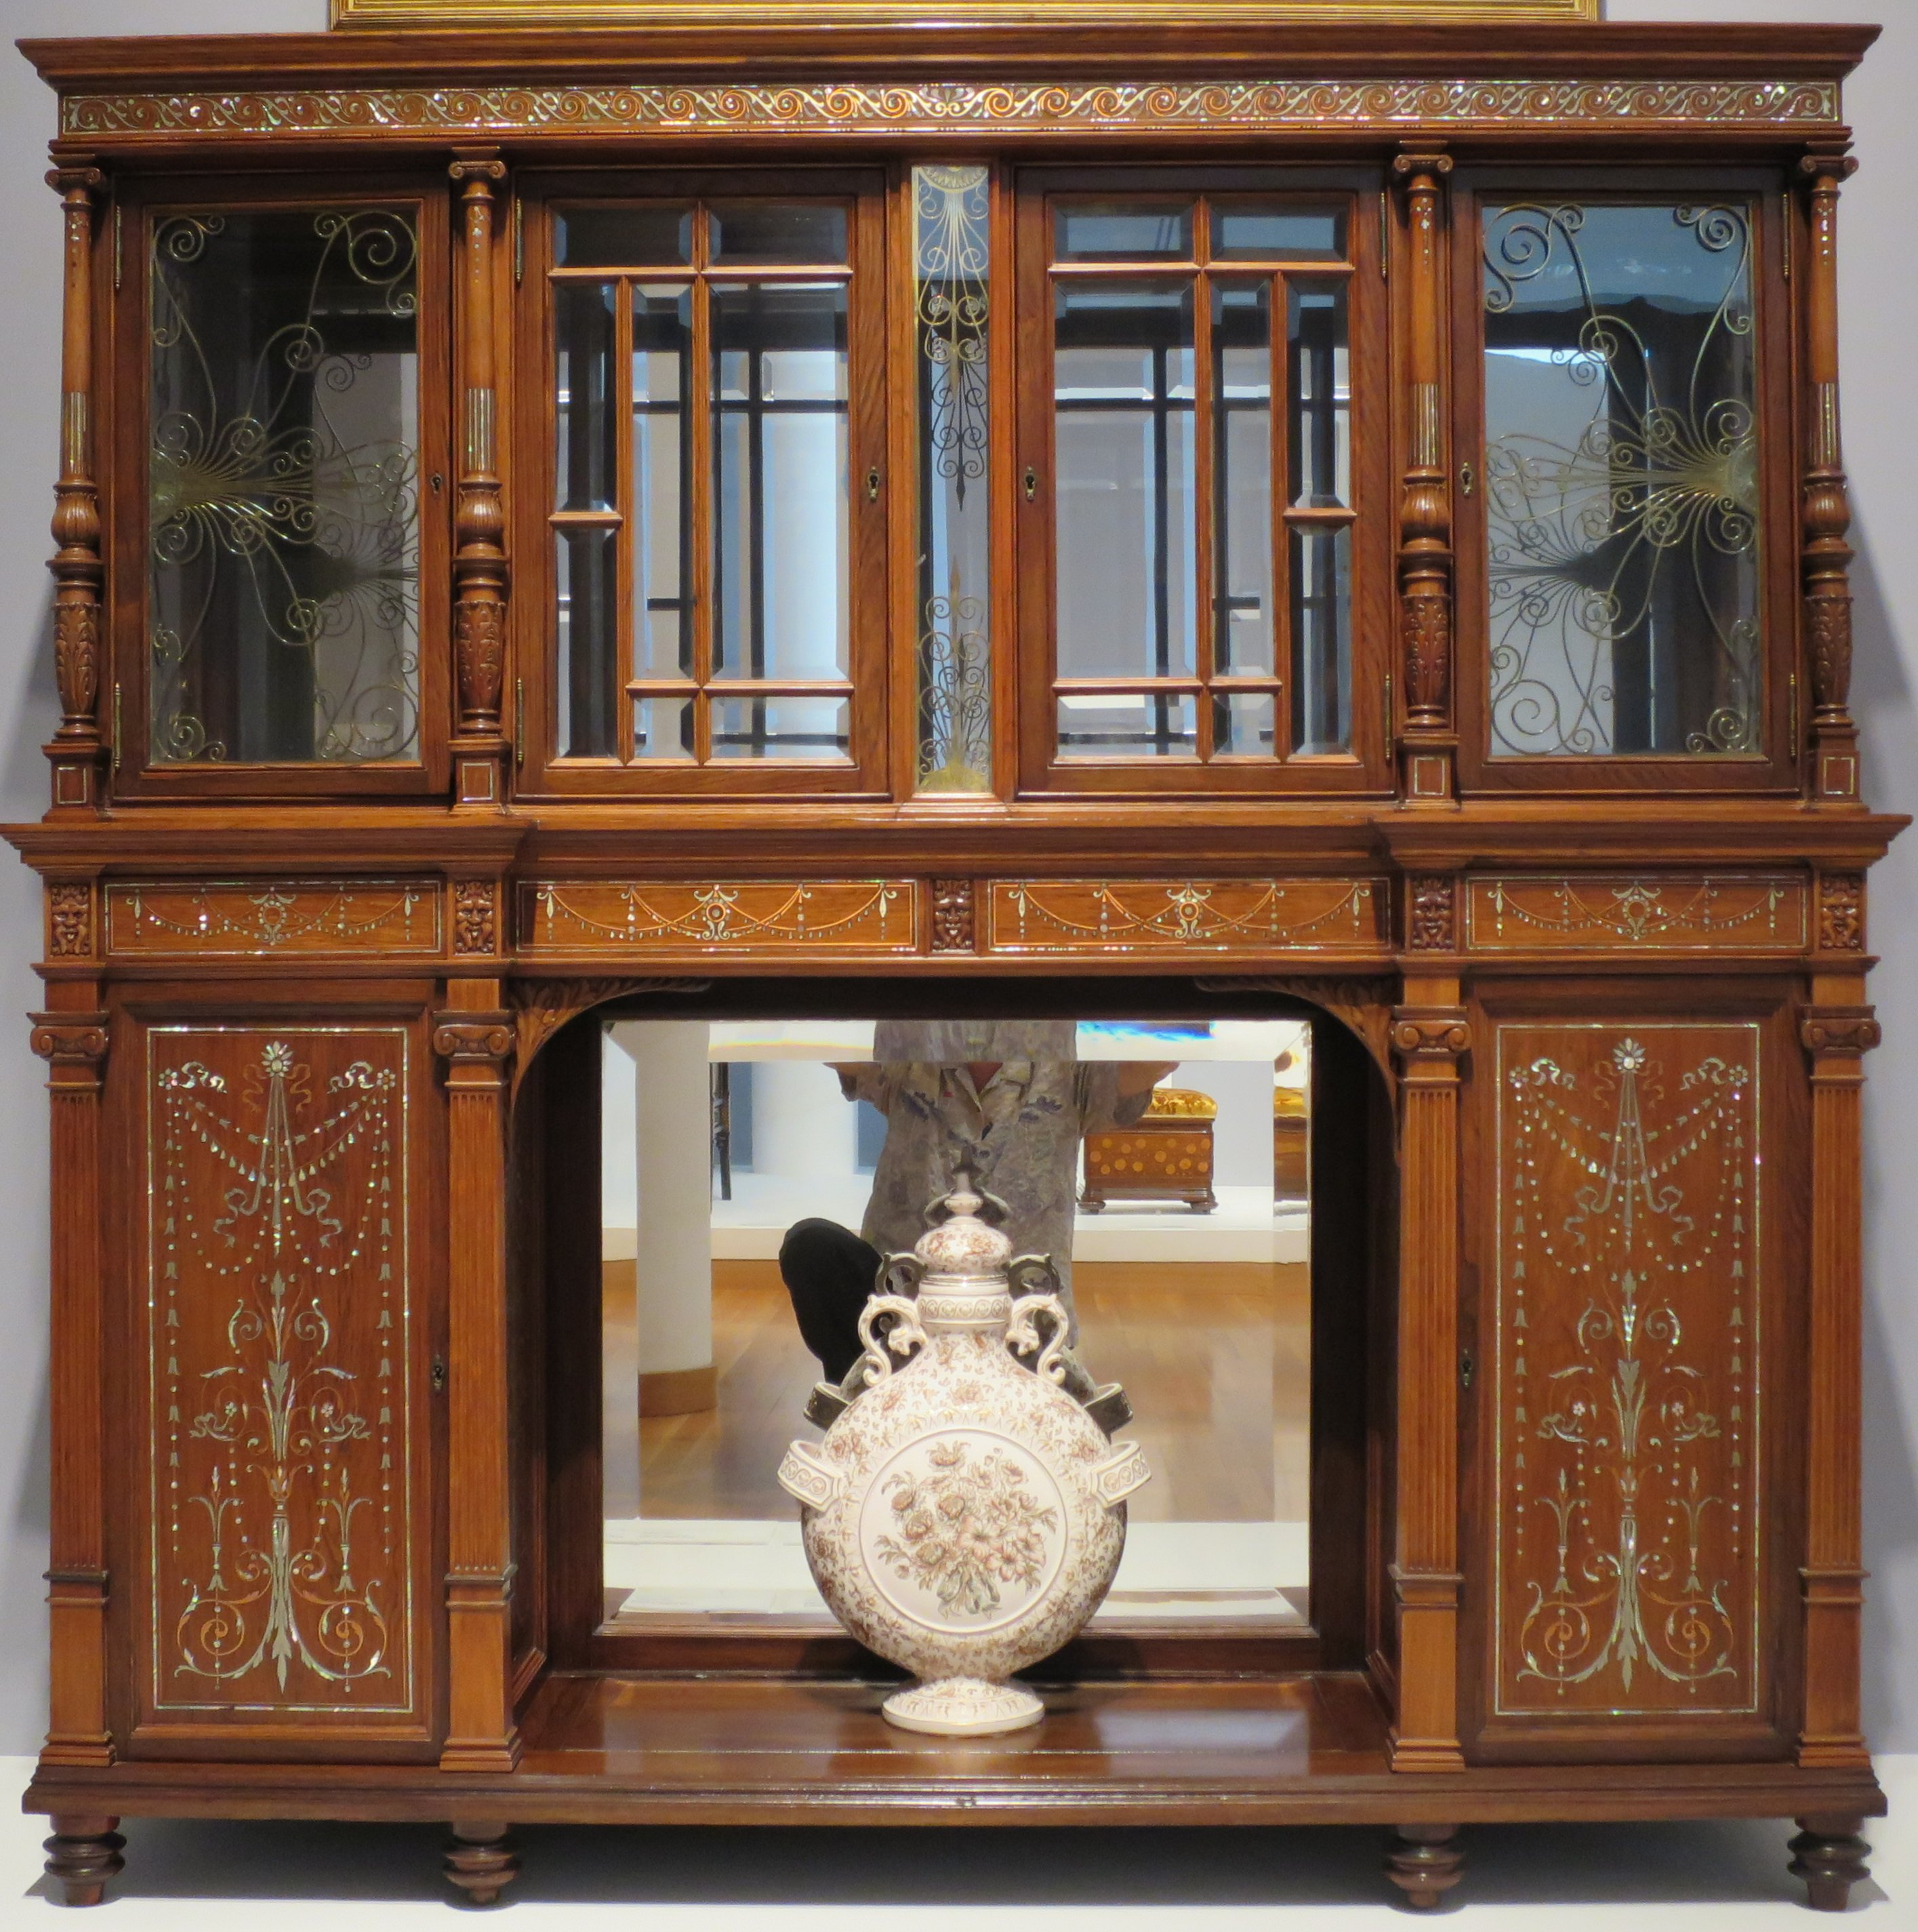 File:Herter Brothers Cabinet, c. 1880, High Museum of Art.JPG ...